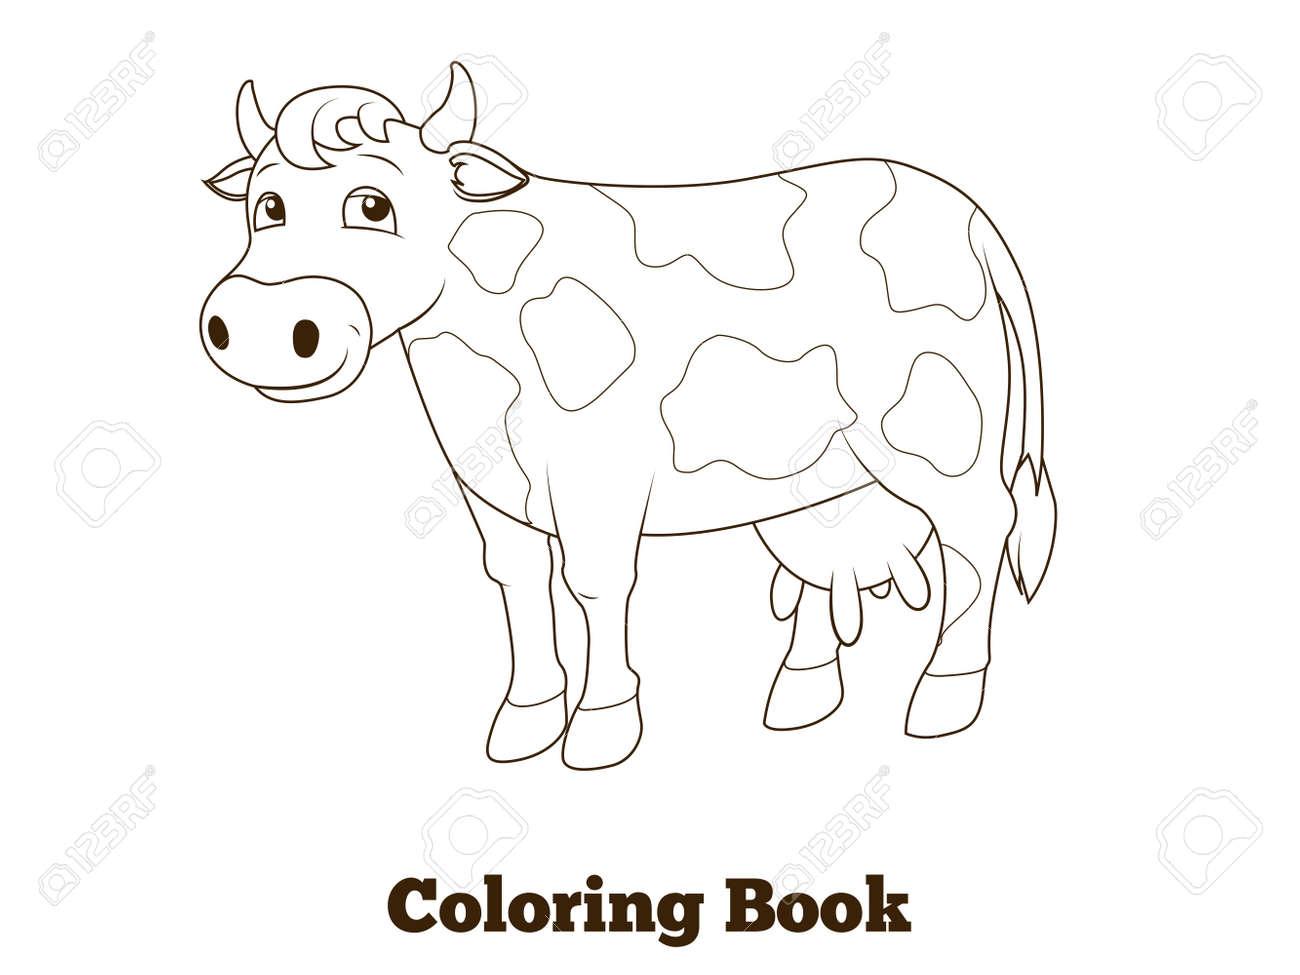 Coloring Book Cow Cartoon Educational Vector Illustration Royalty ...